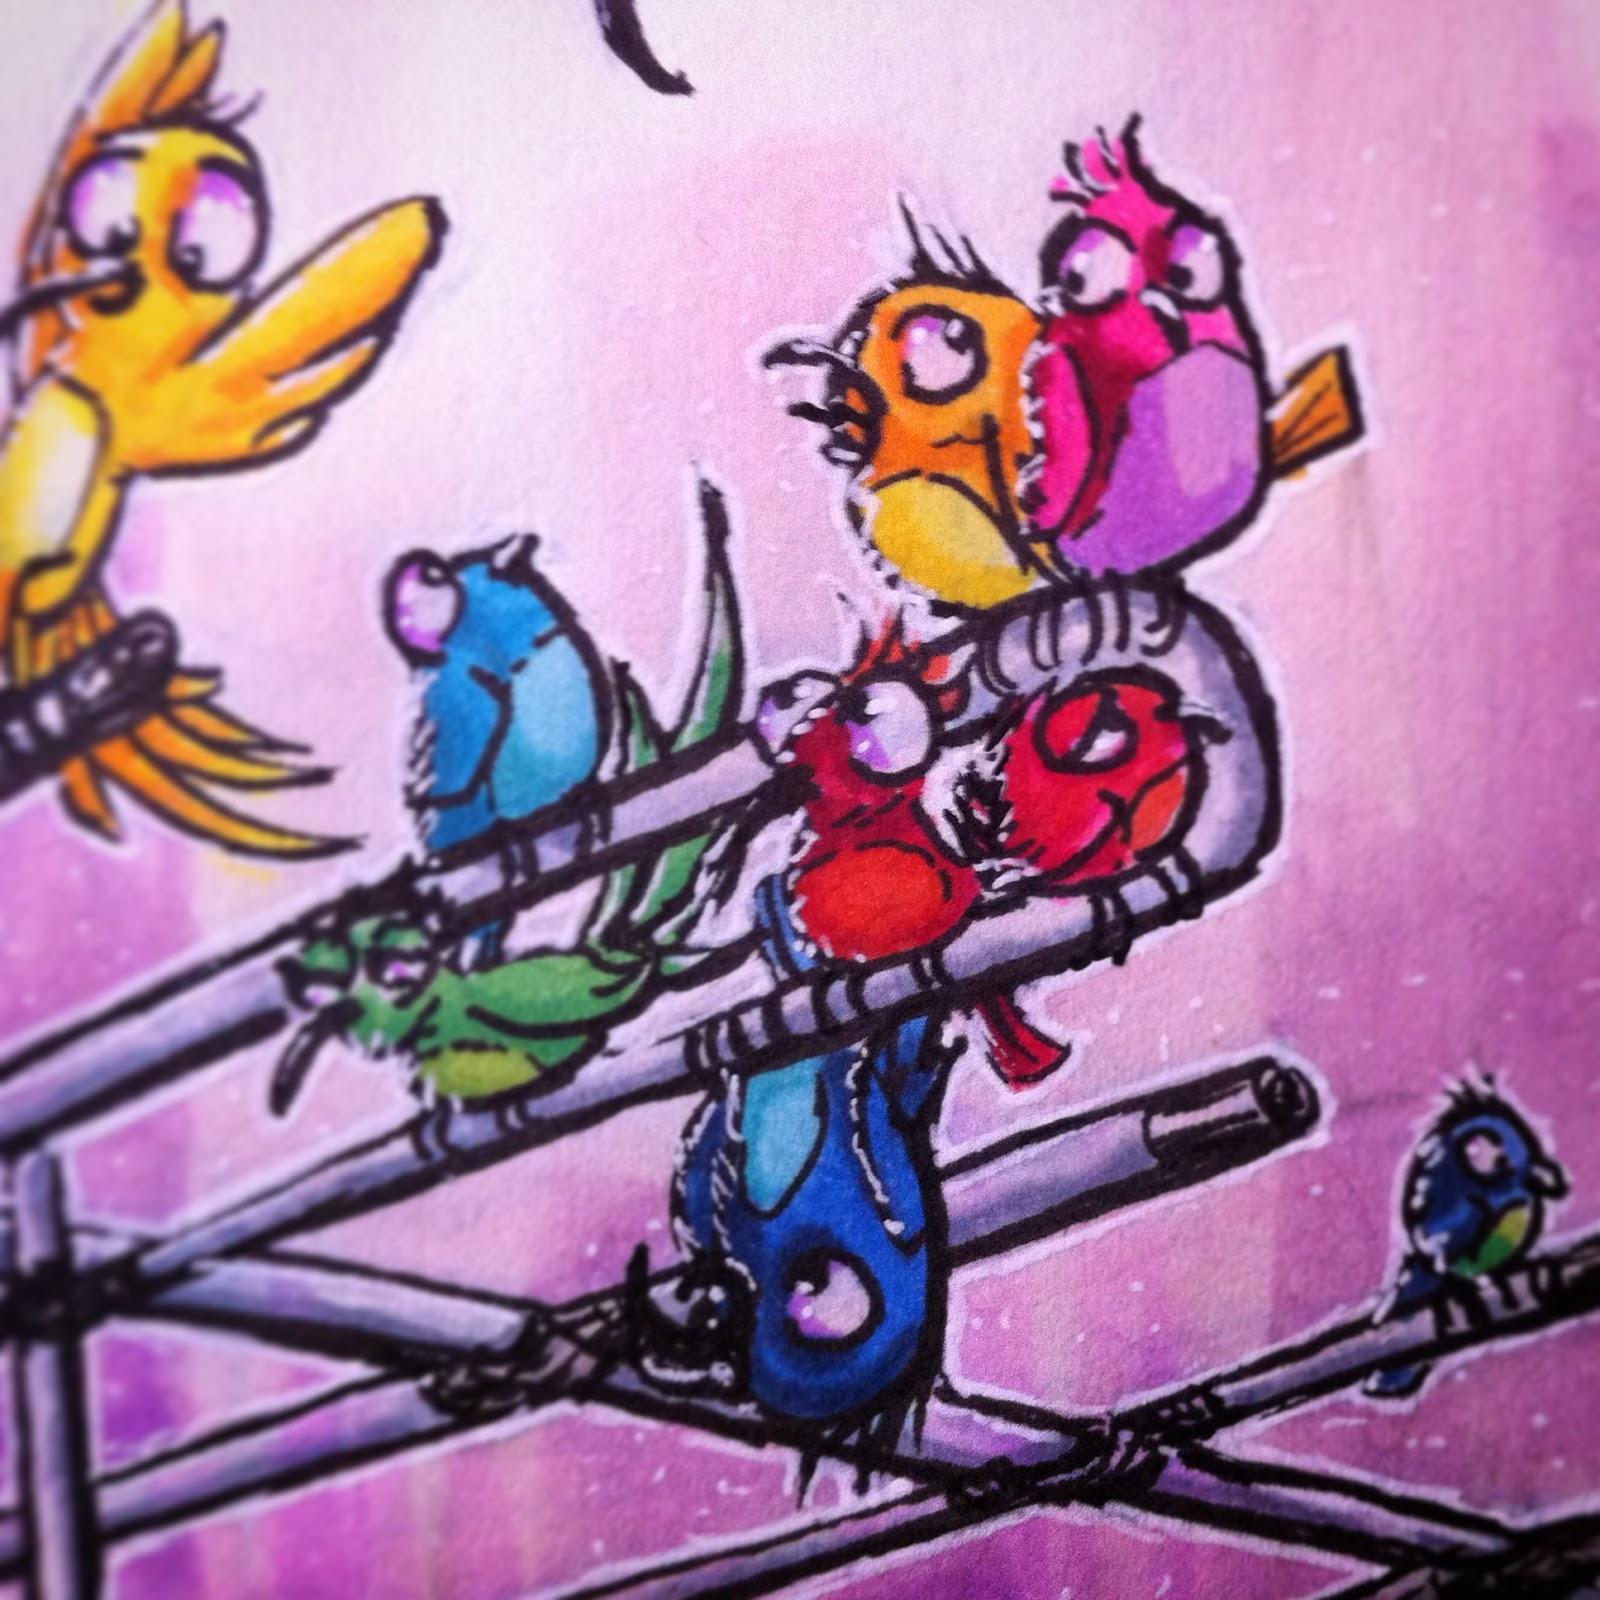 'Birdies' - Albert Casado (nfok-e) - Close-up